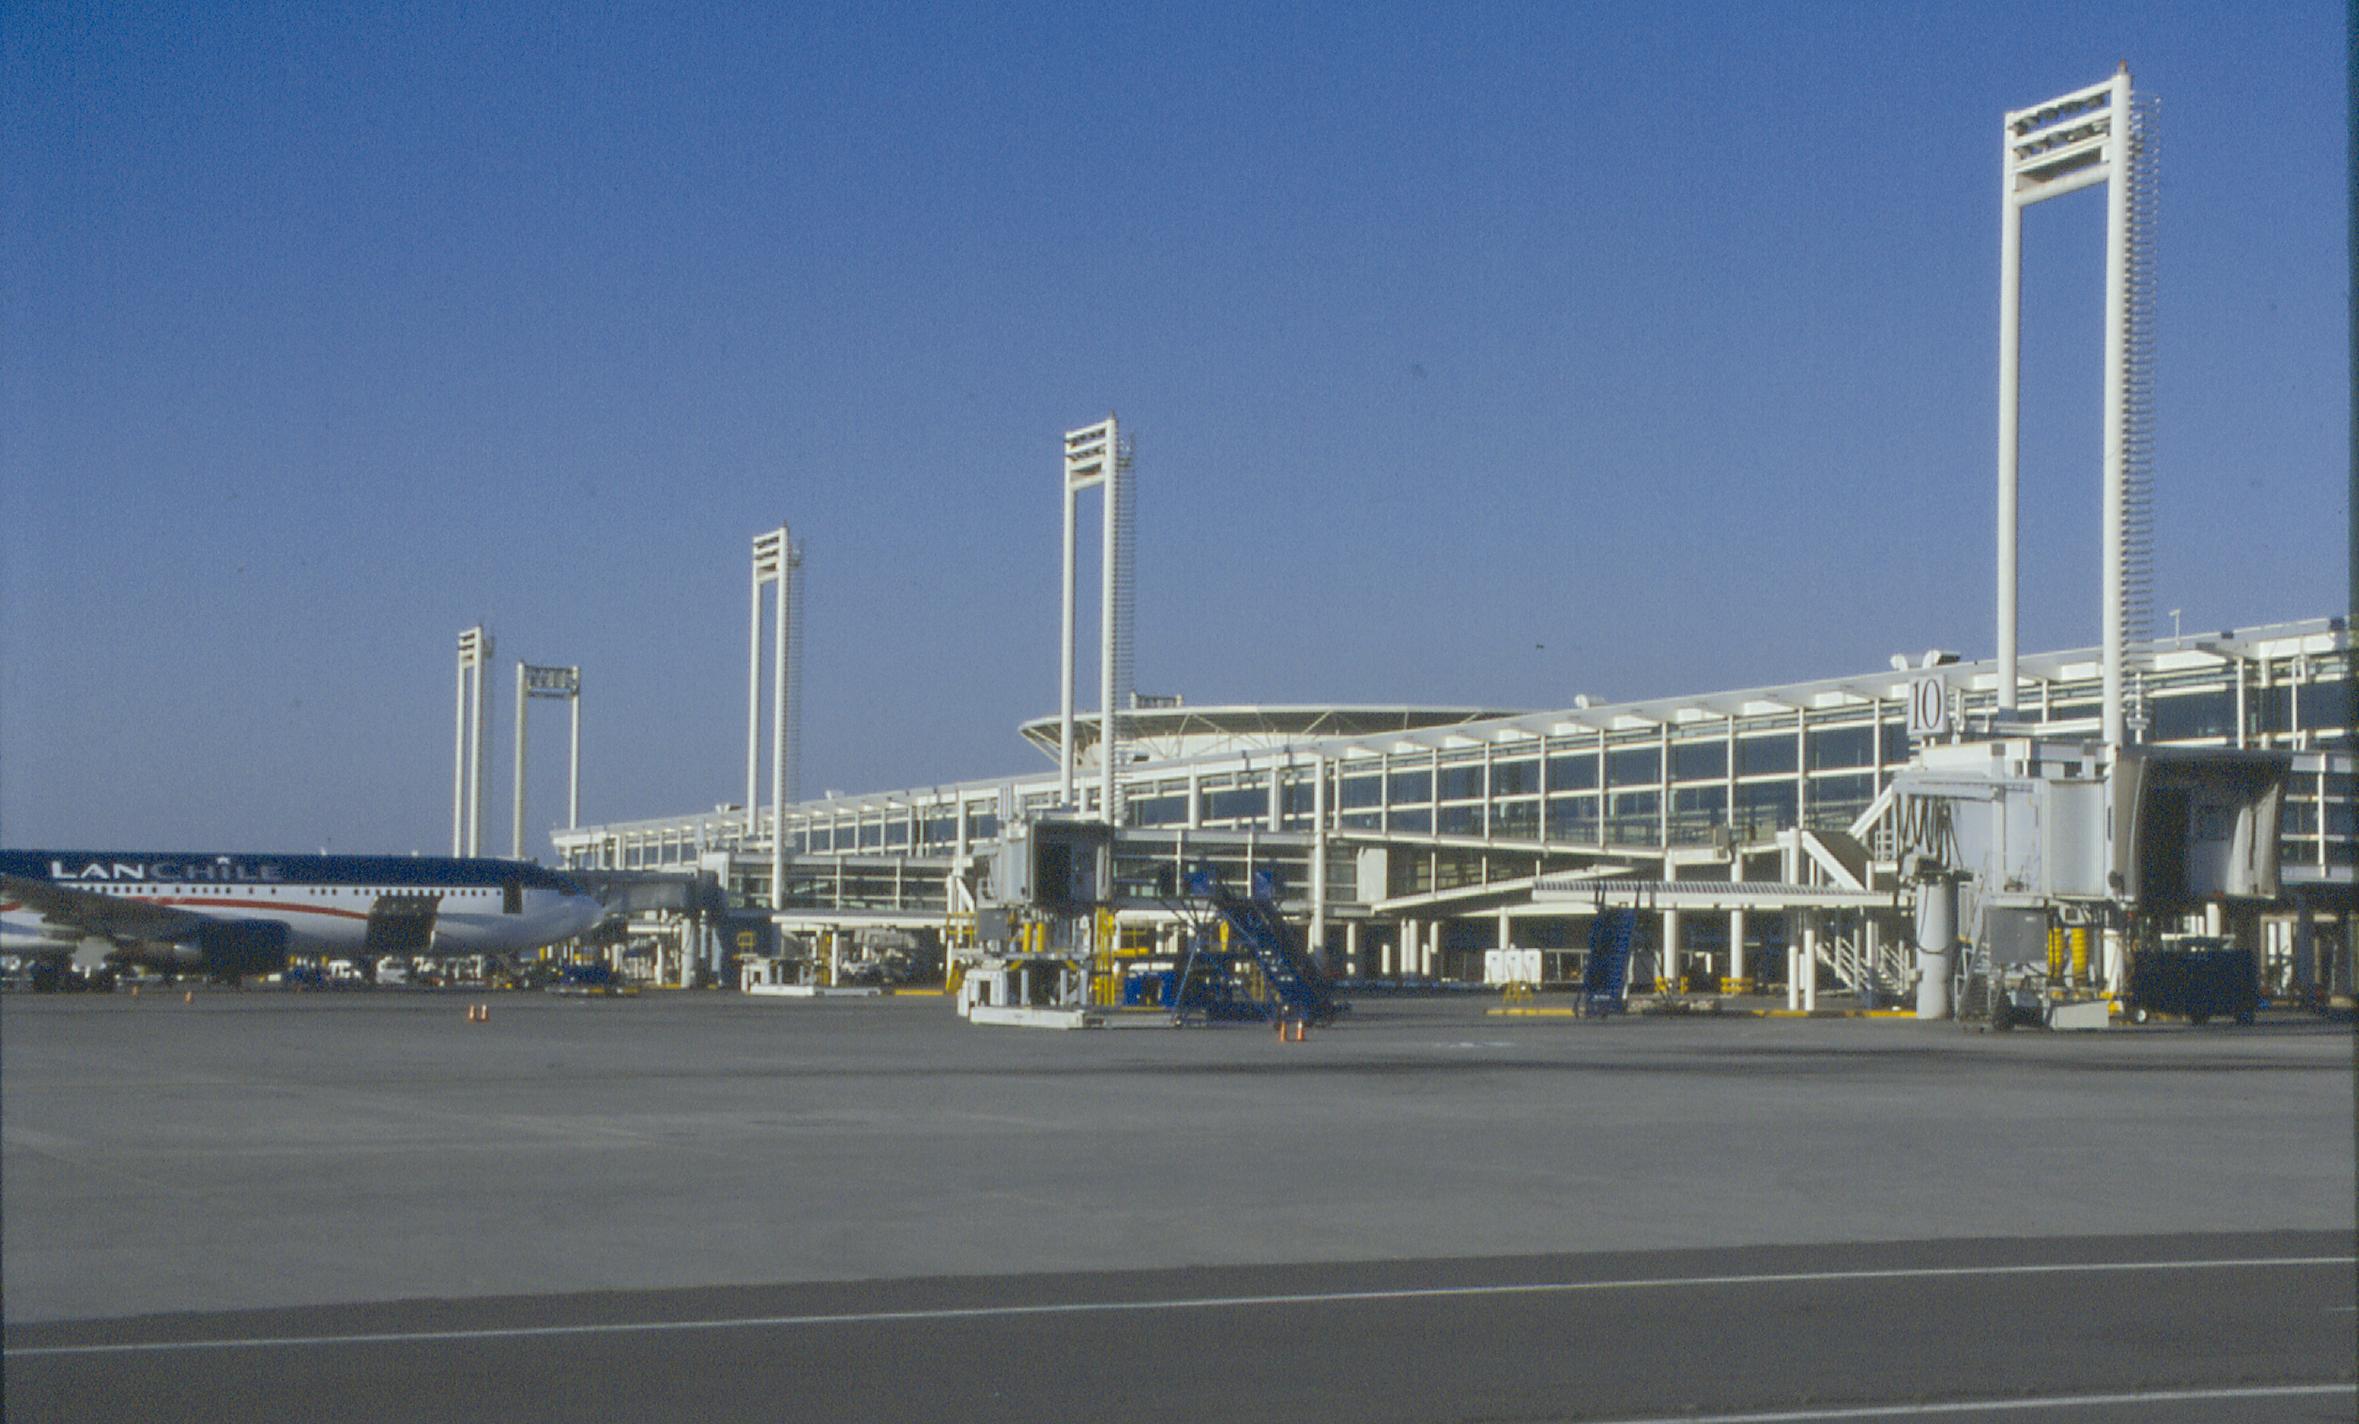 Aeropuerto de Chile aviones manga